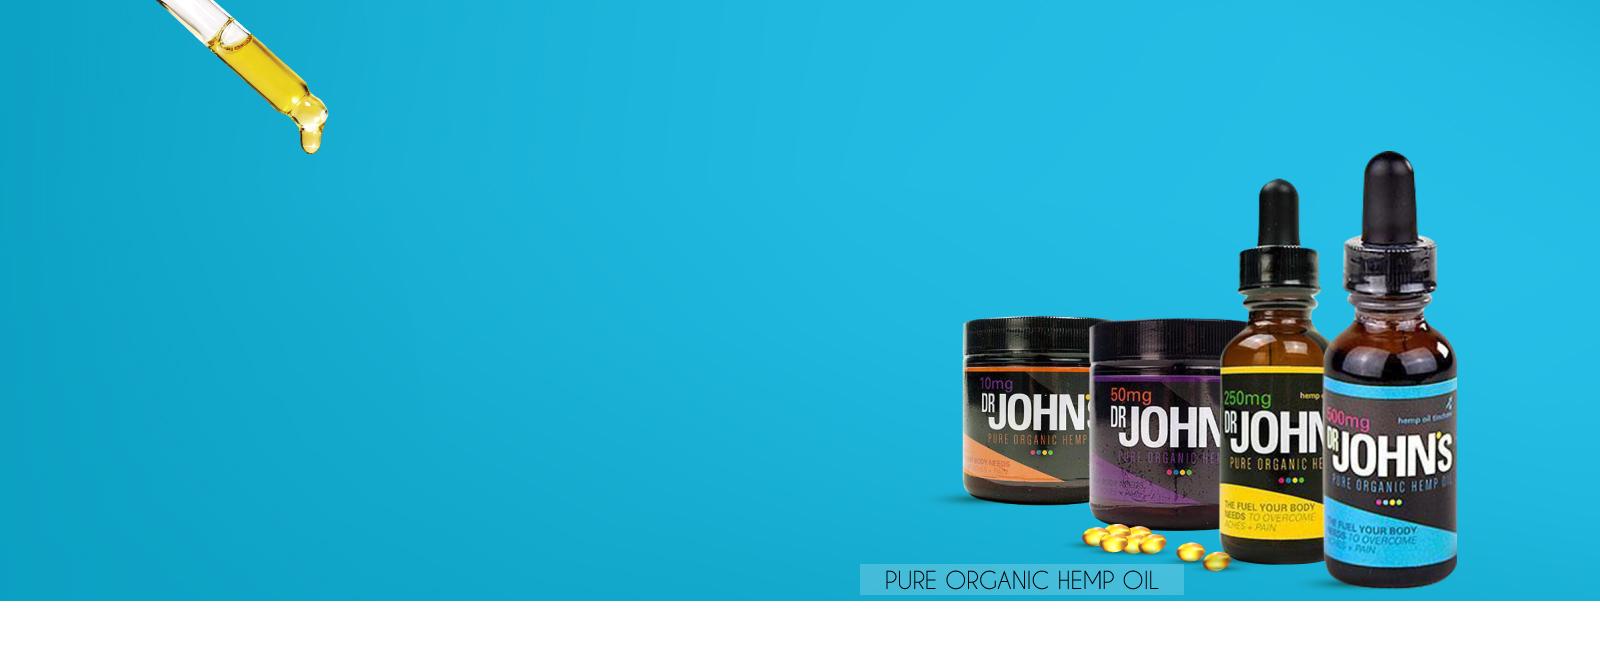 Home   Dr. John's Hemp Remedies Wholesale   Pure Organic Hemp Oil